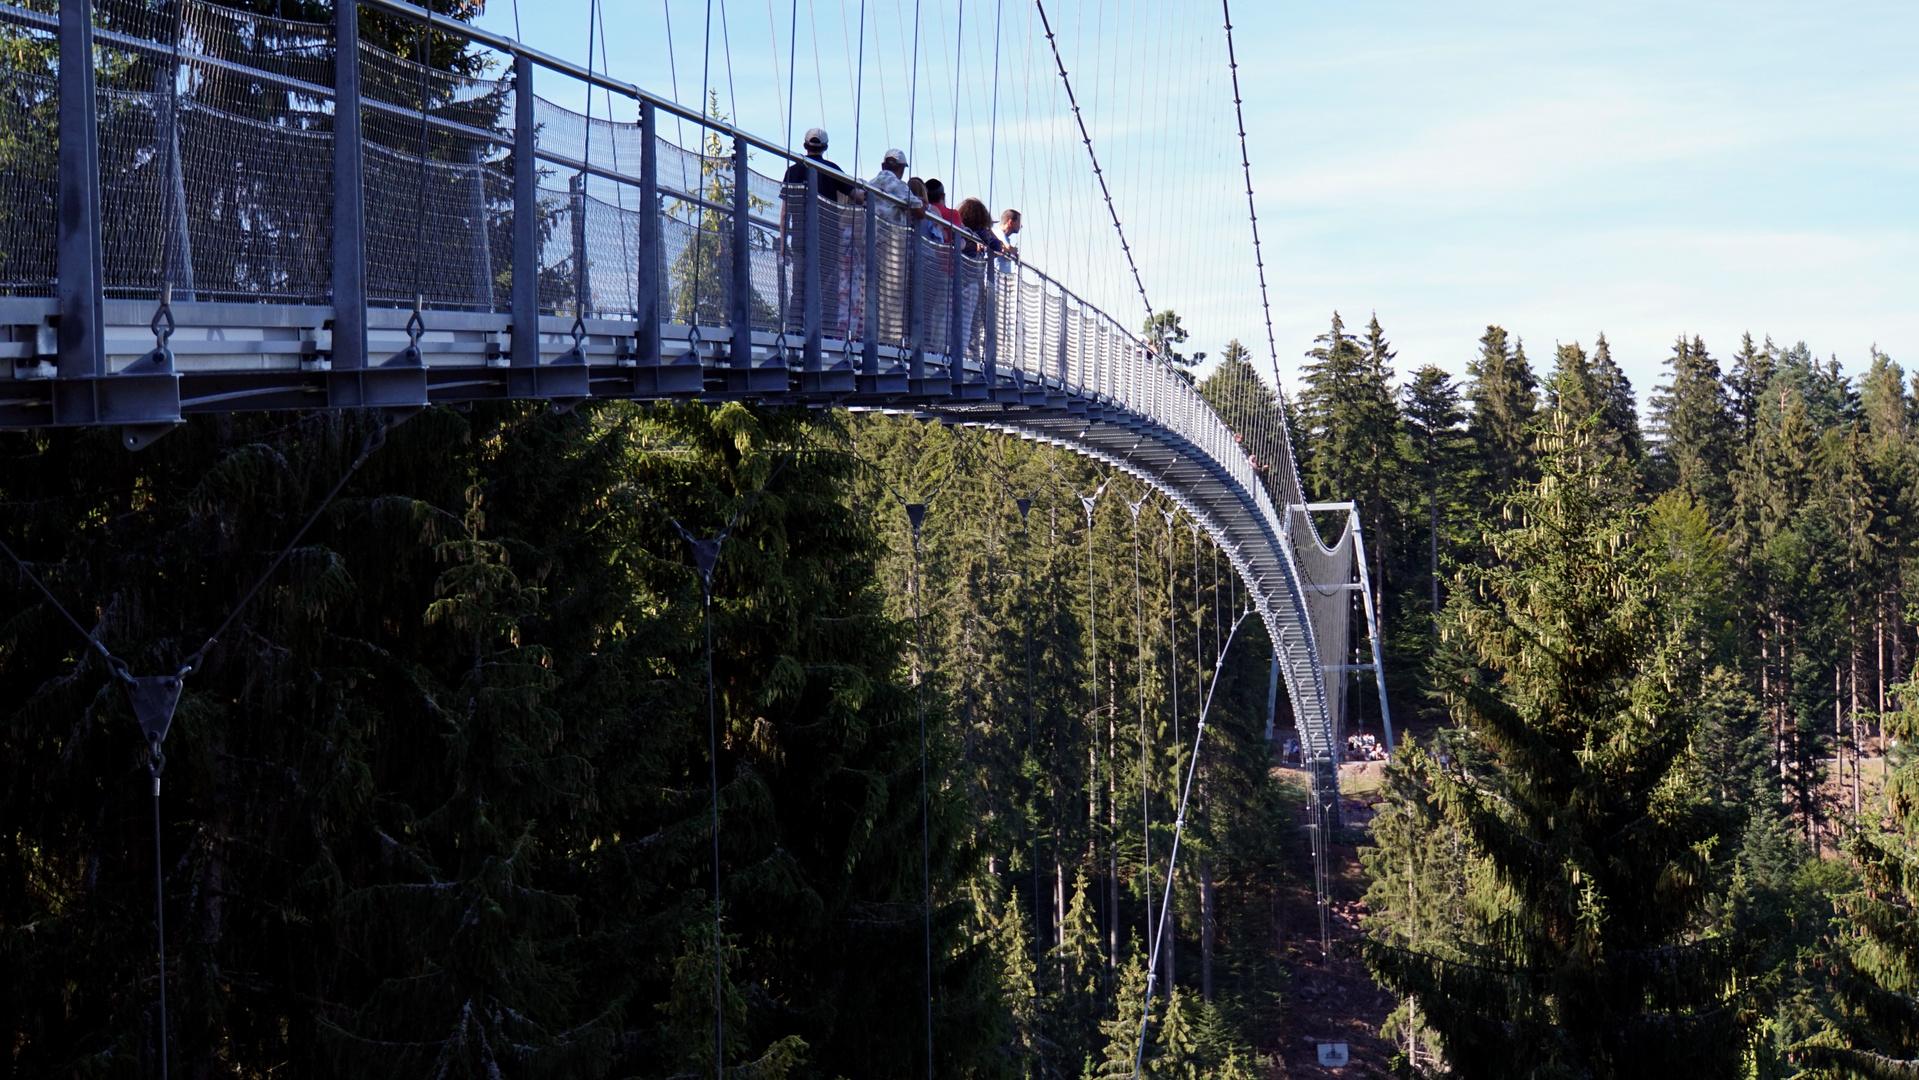 Hängebrücke Bad Wildbad